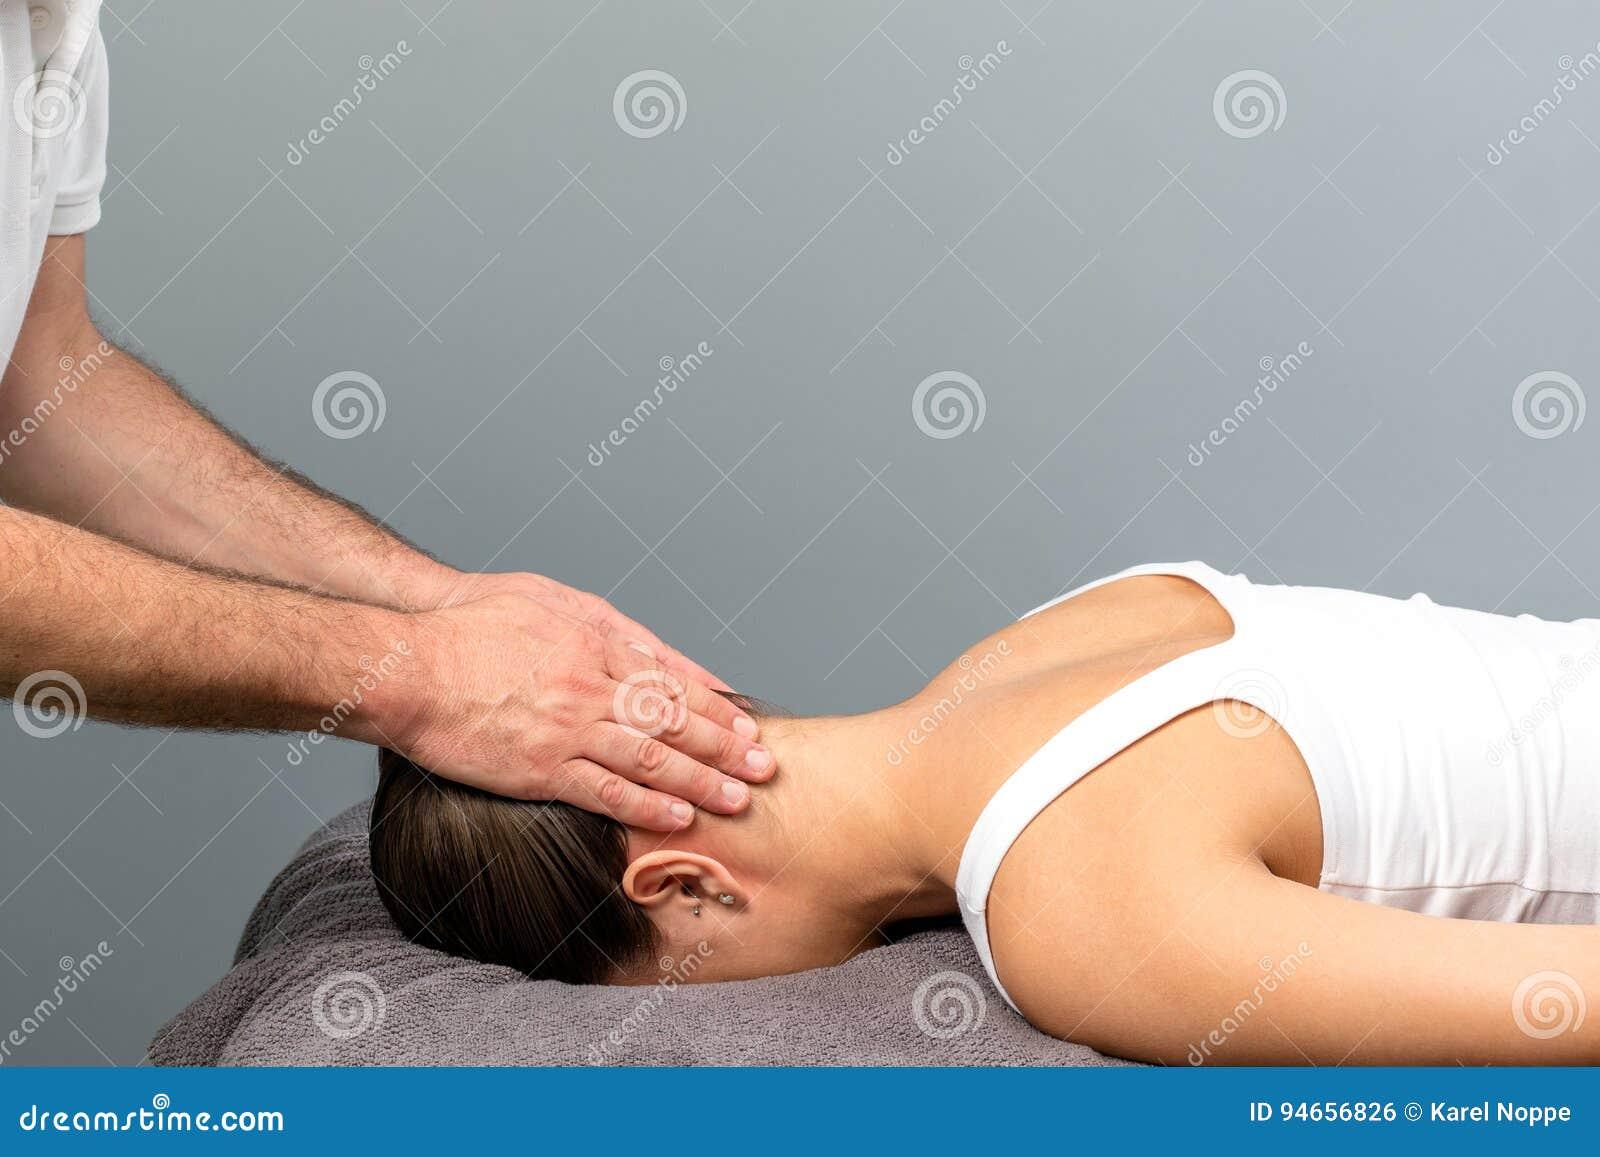 Therapist Applying Pressure On Back Of Female Head  Stock